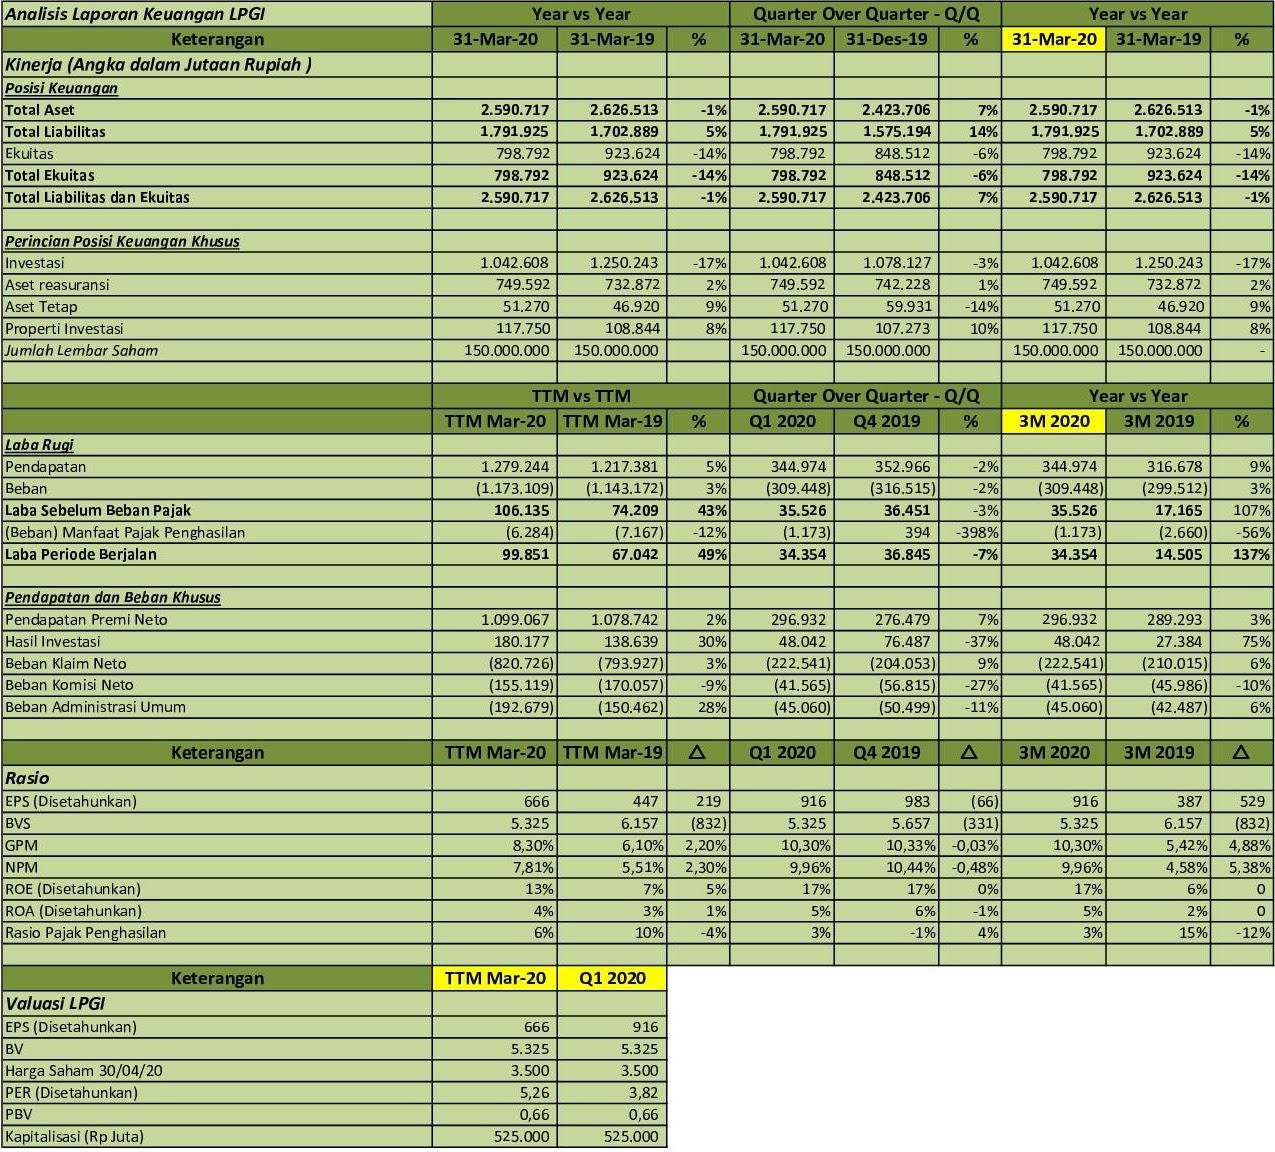 Idx Investor Lpgi Q1 2020 Pt Lippo General Insurance Tbk Analisis Laporan Keuangan